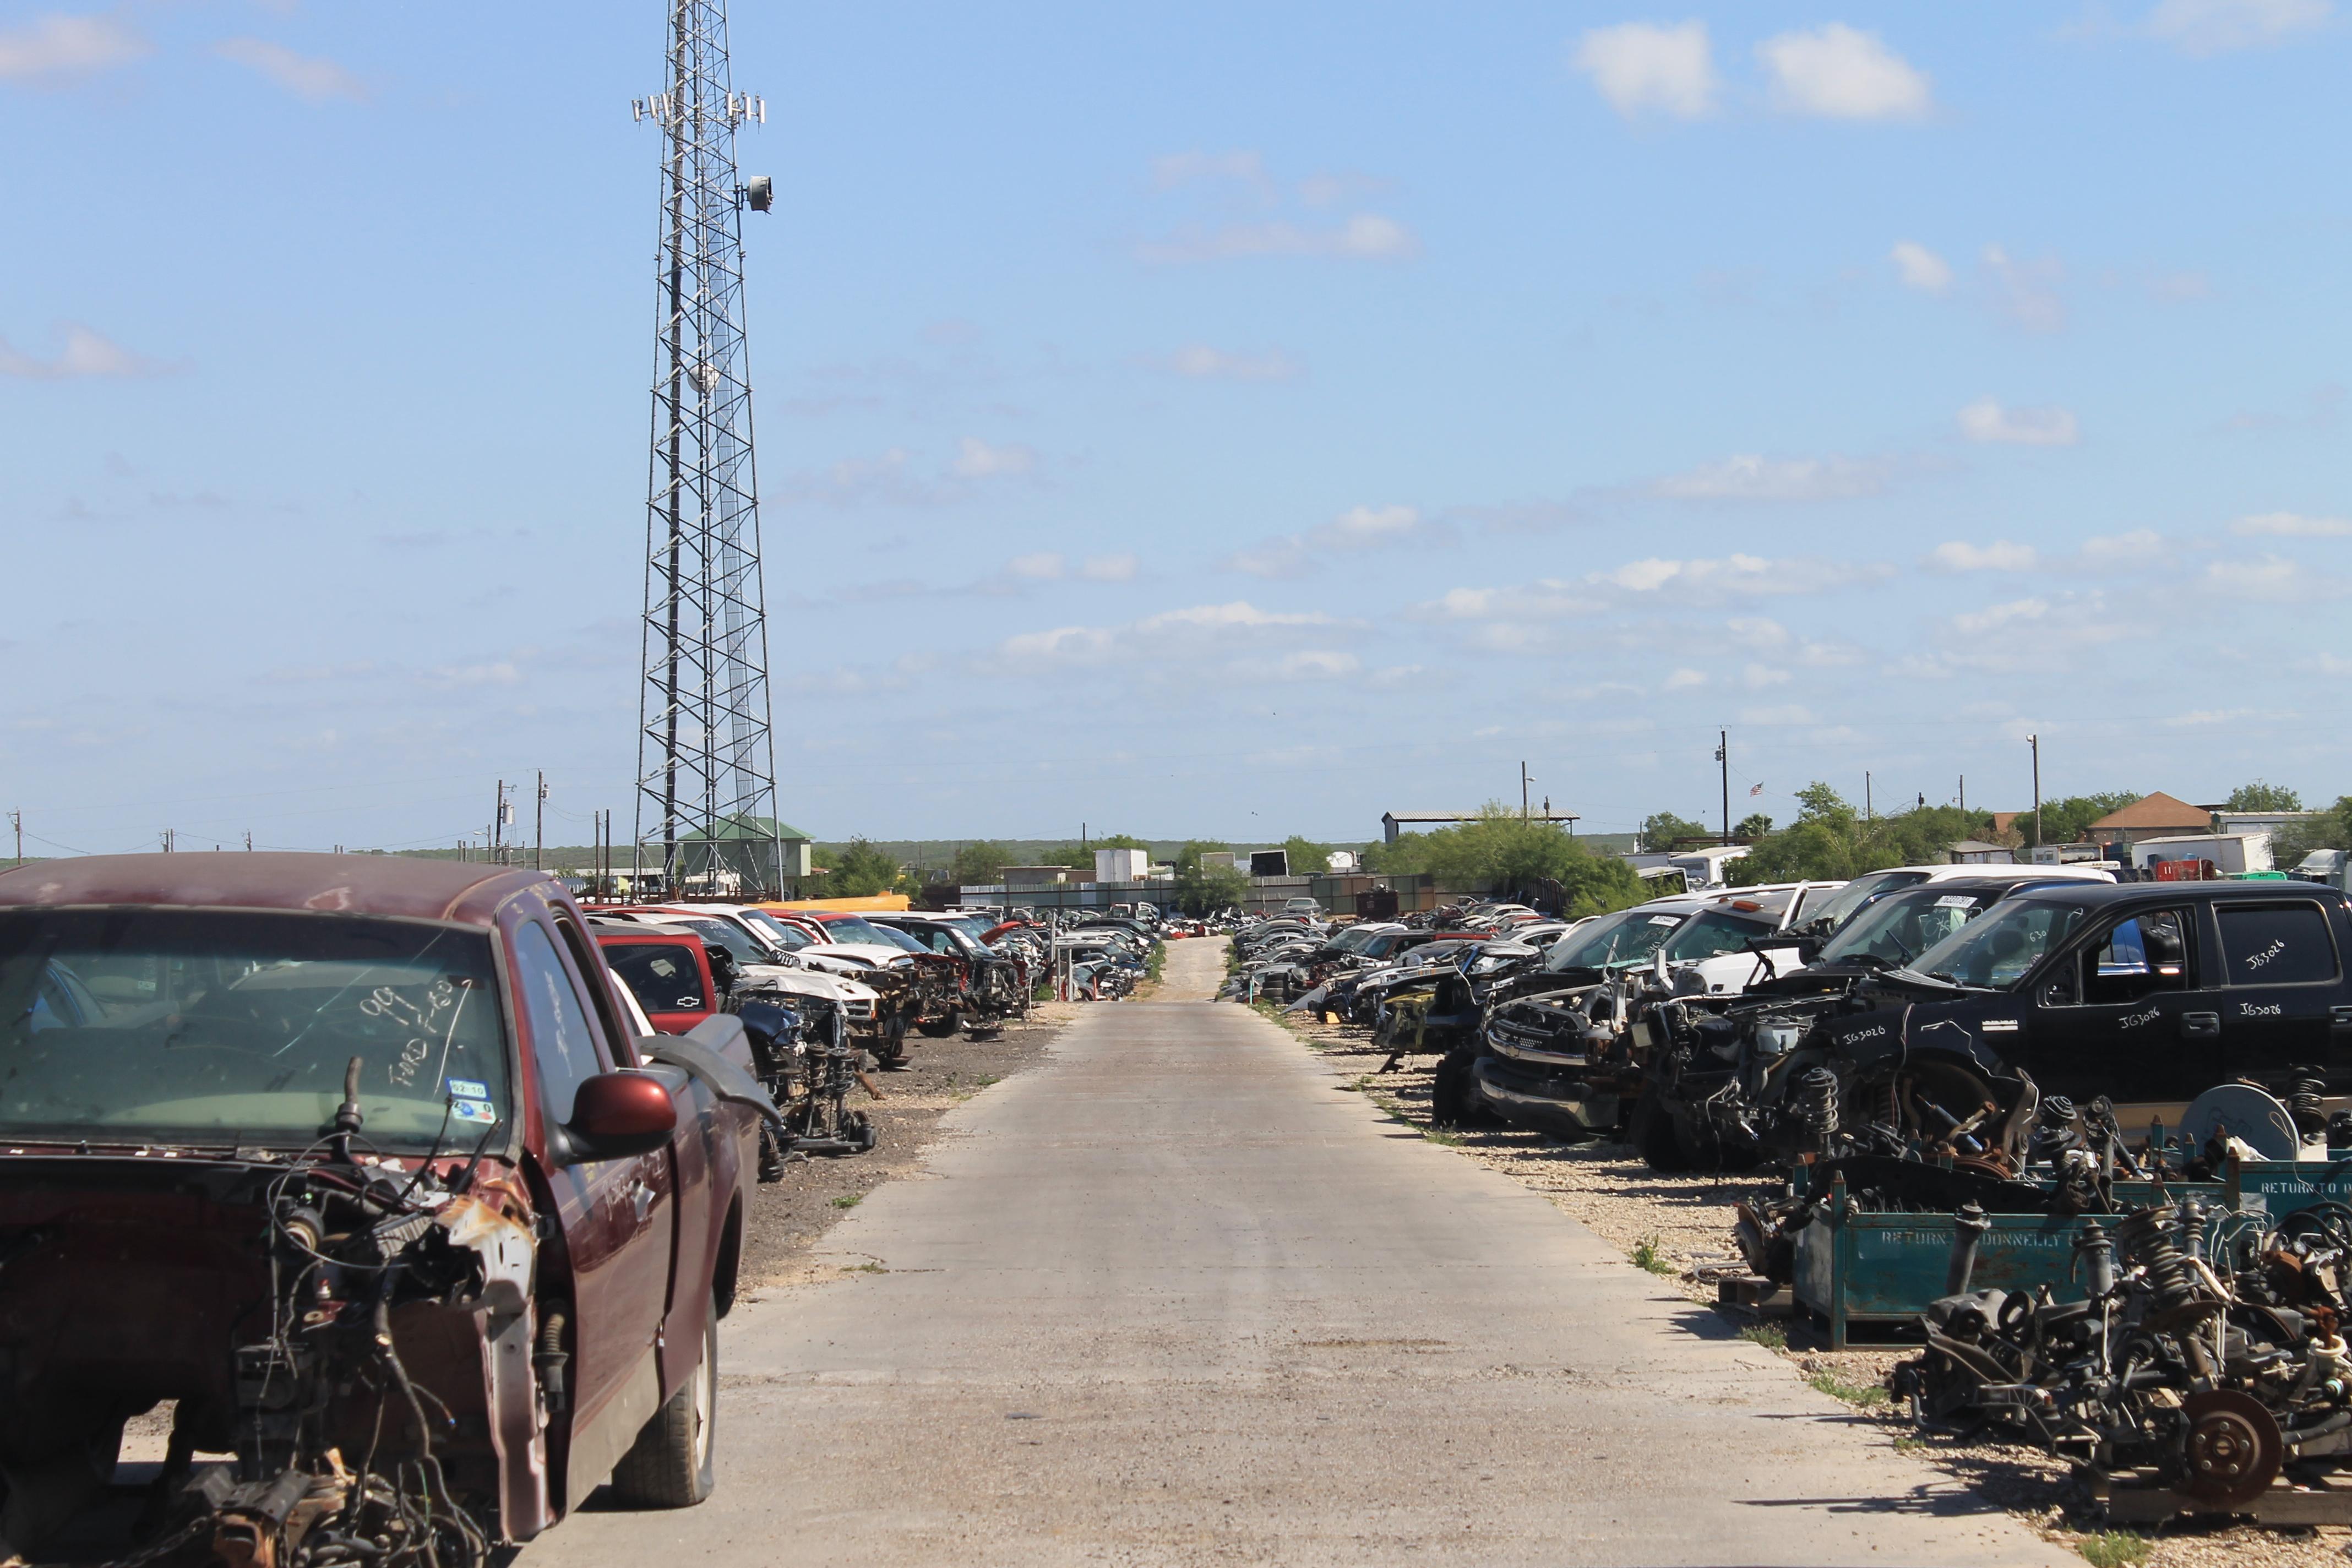 Metro Auto Parts >> Jg Metro Auto Parts Inc 7030 State Highway 359 Laredo Tx 78043